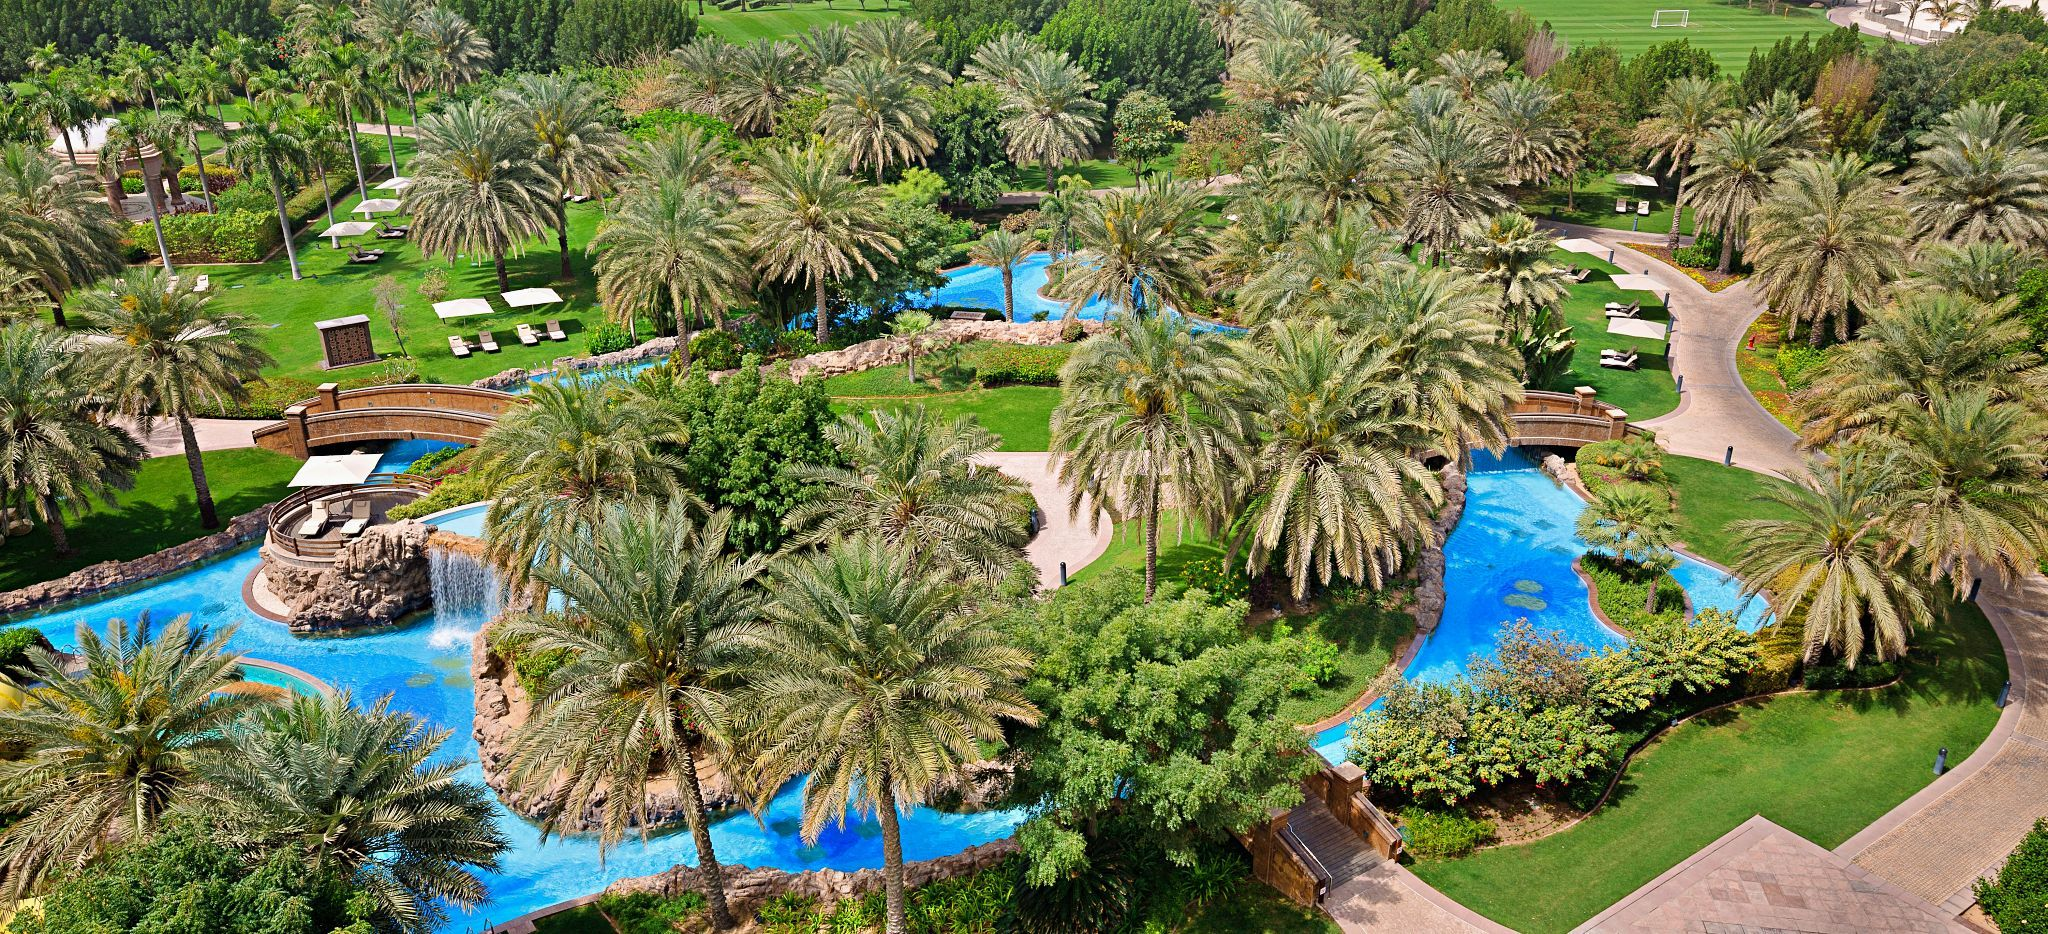 Wasserpark des Hotels Emirates Palace